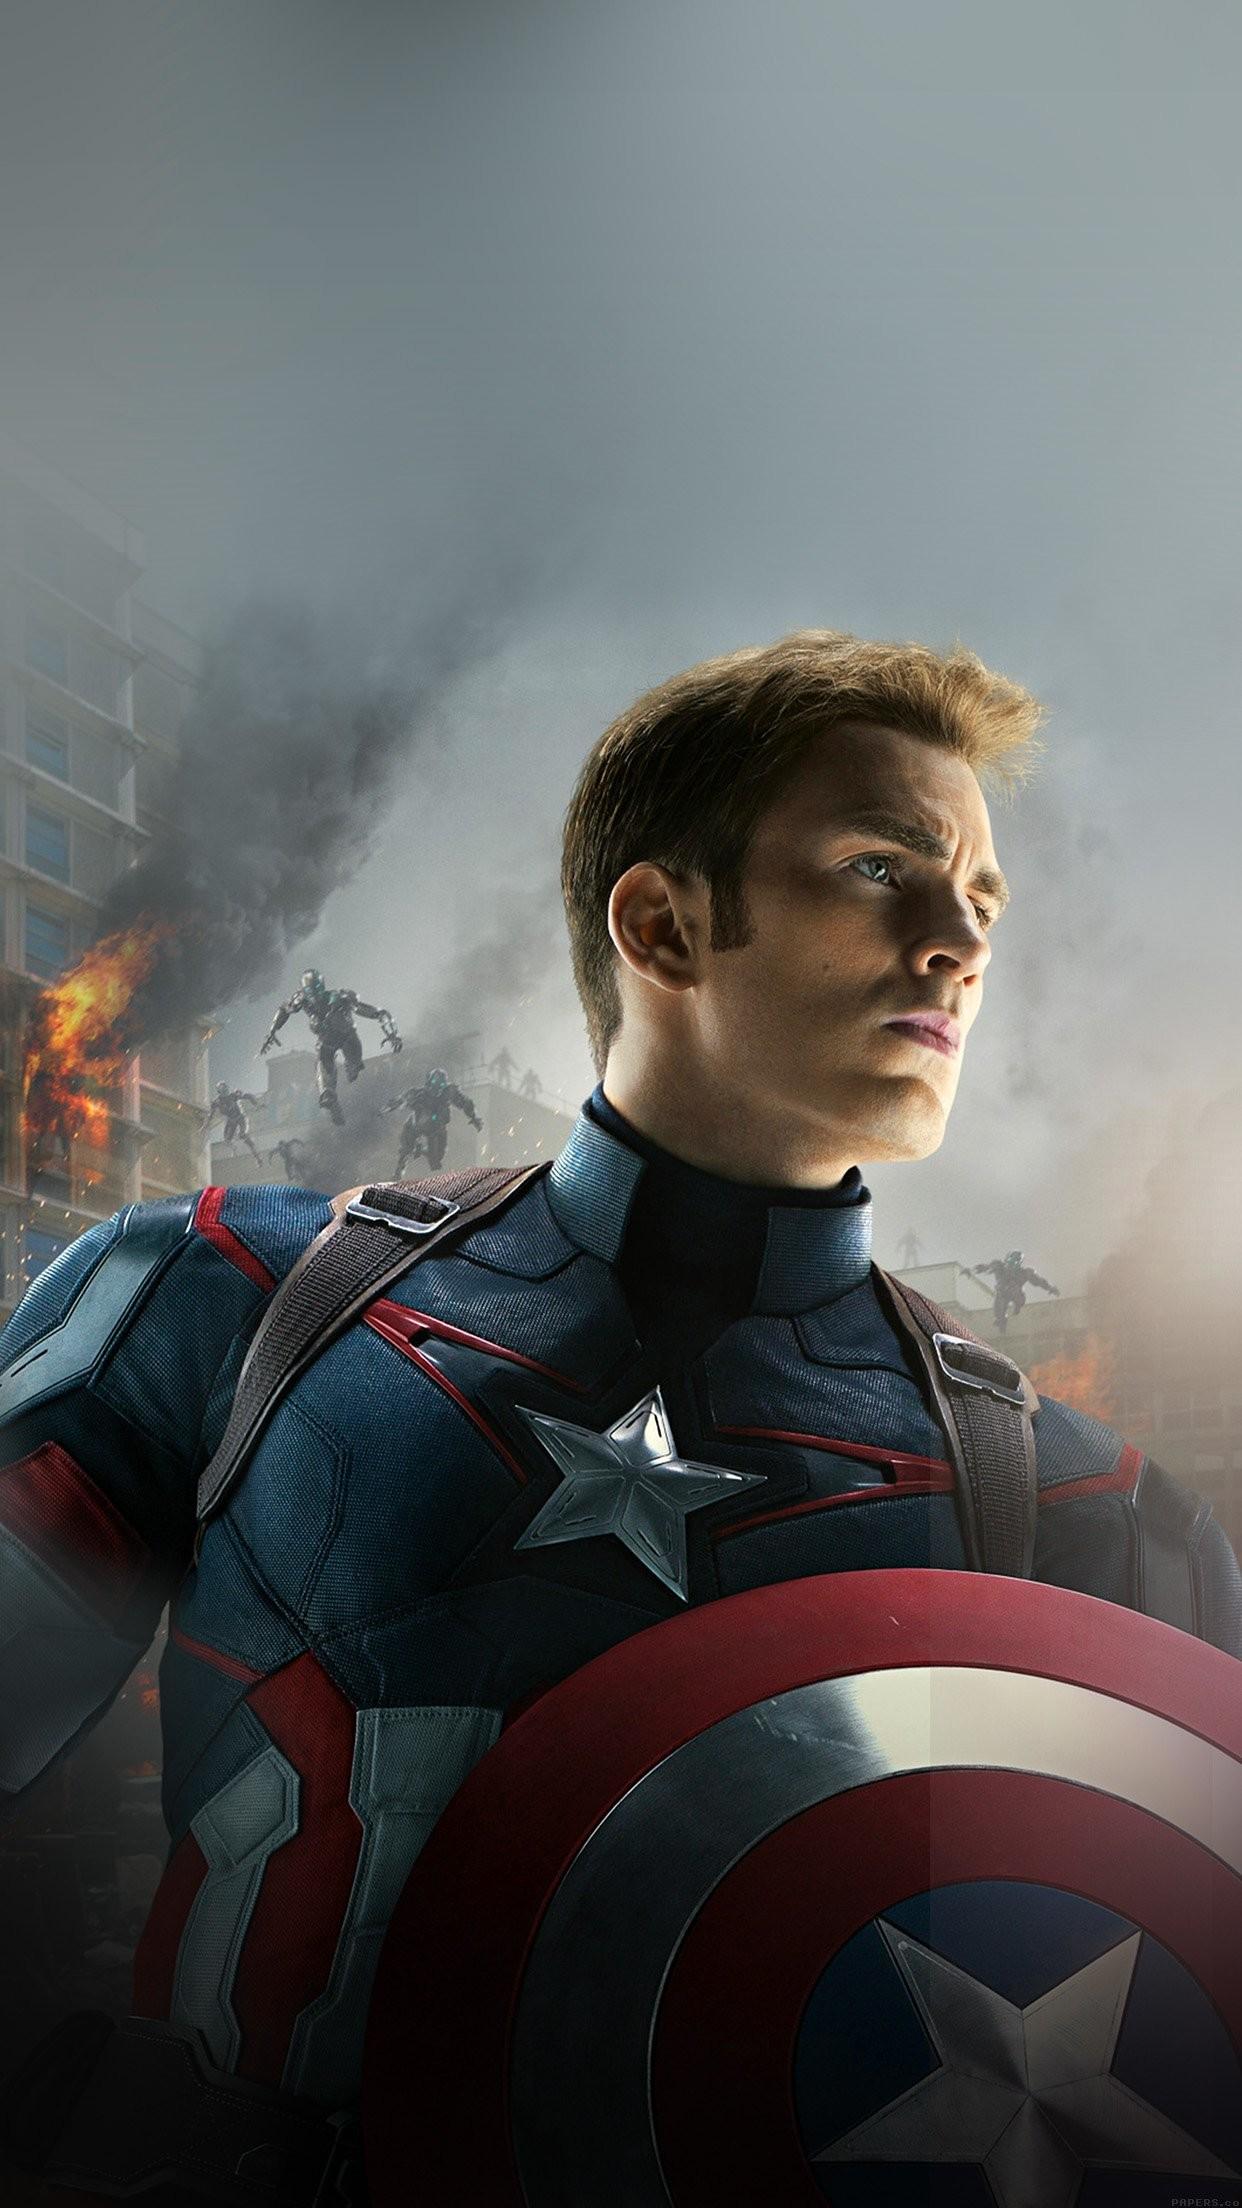 Captain America Iphone 6 Wallpaper 85 Images